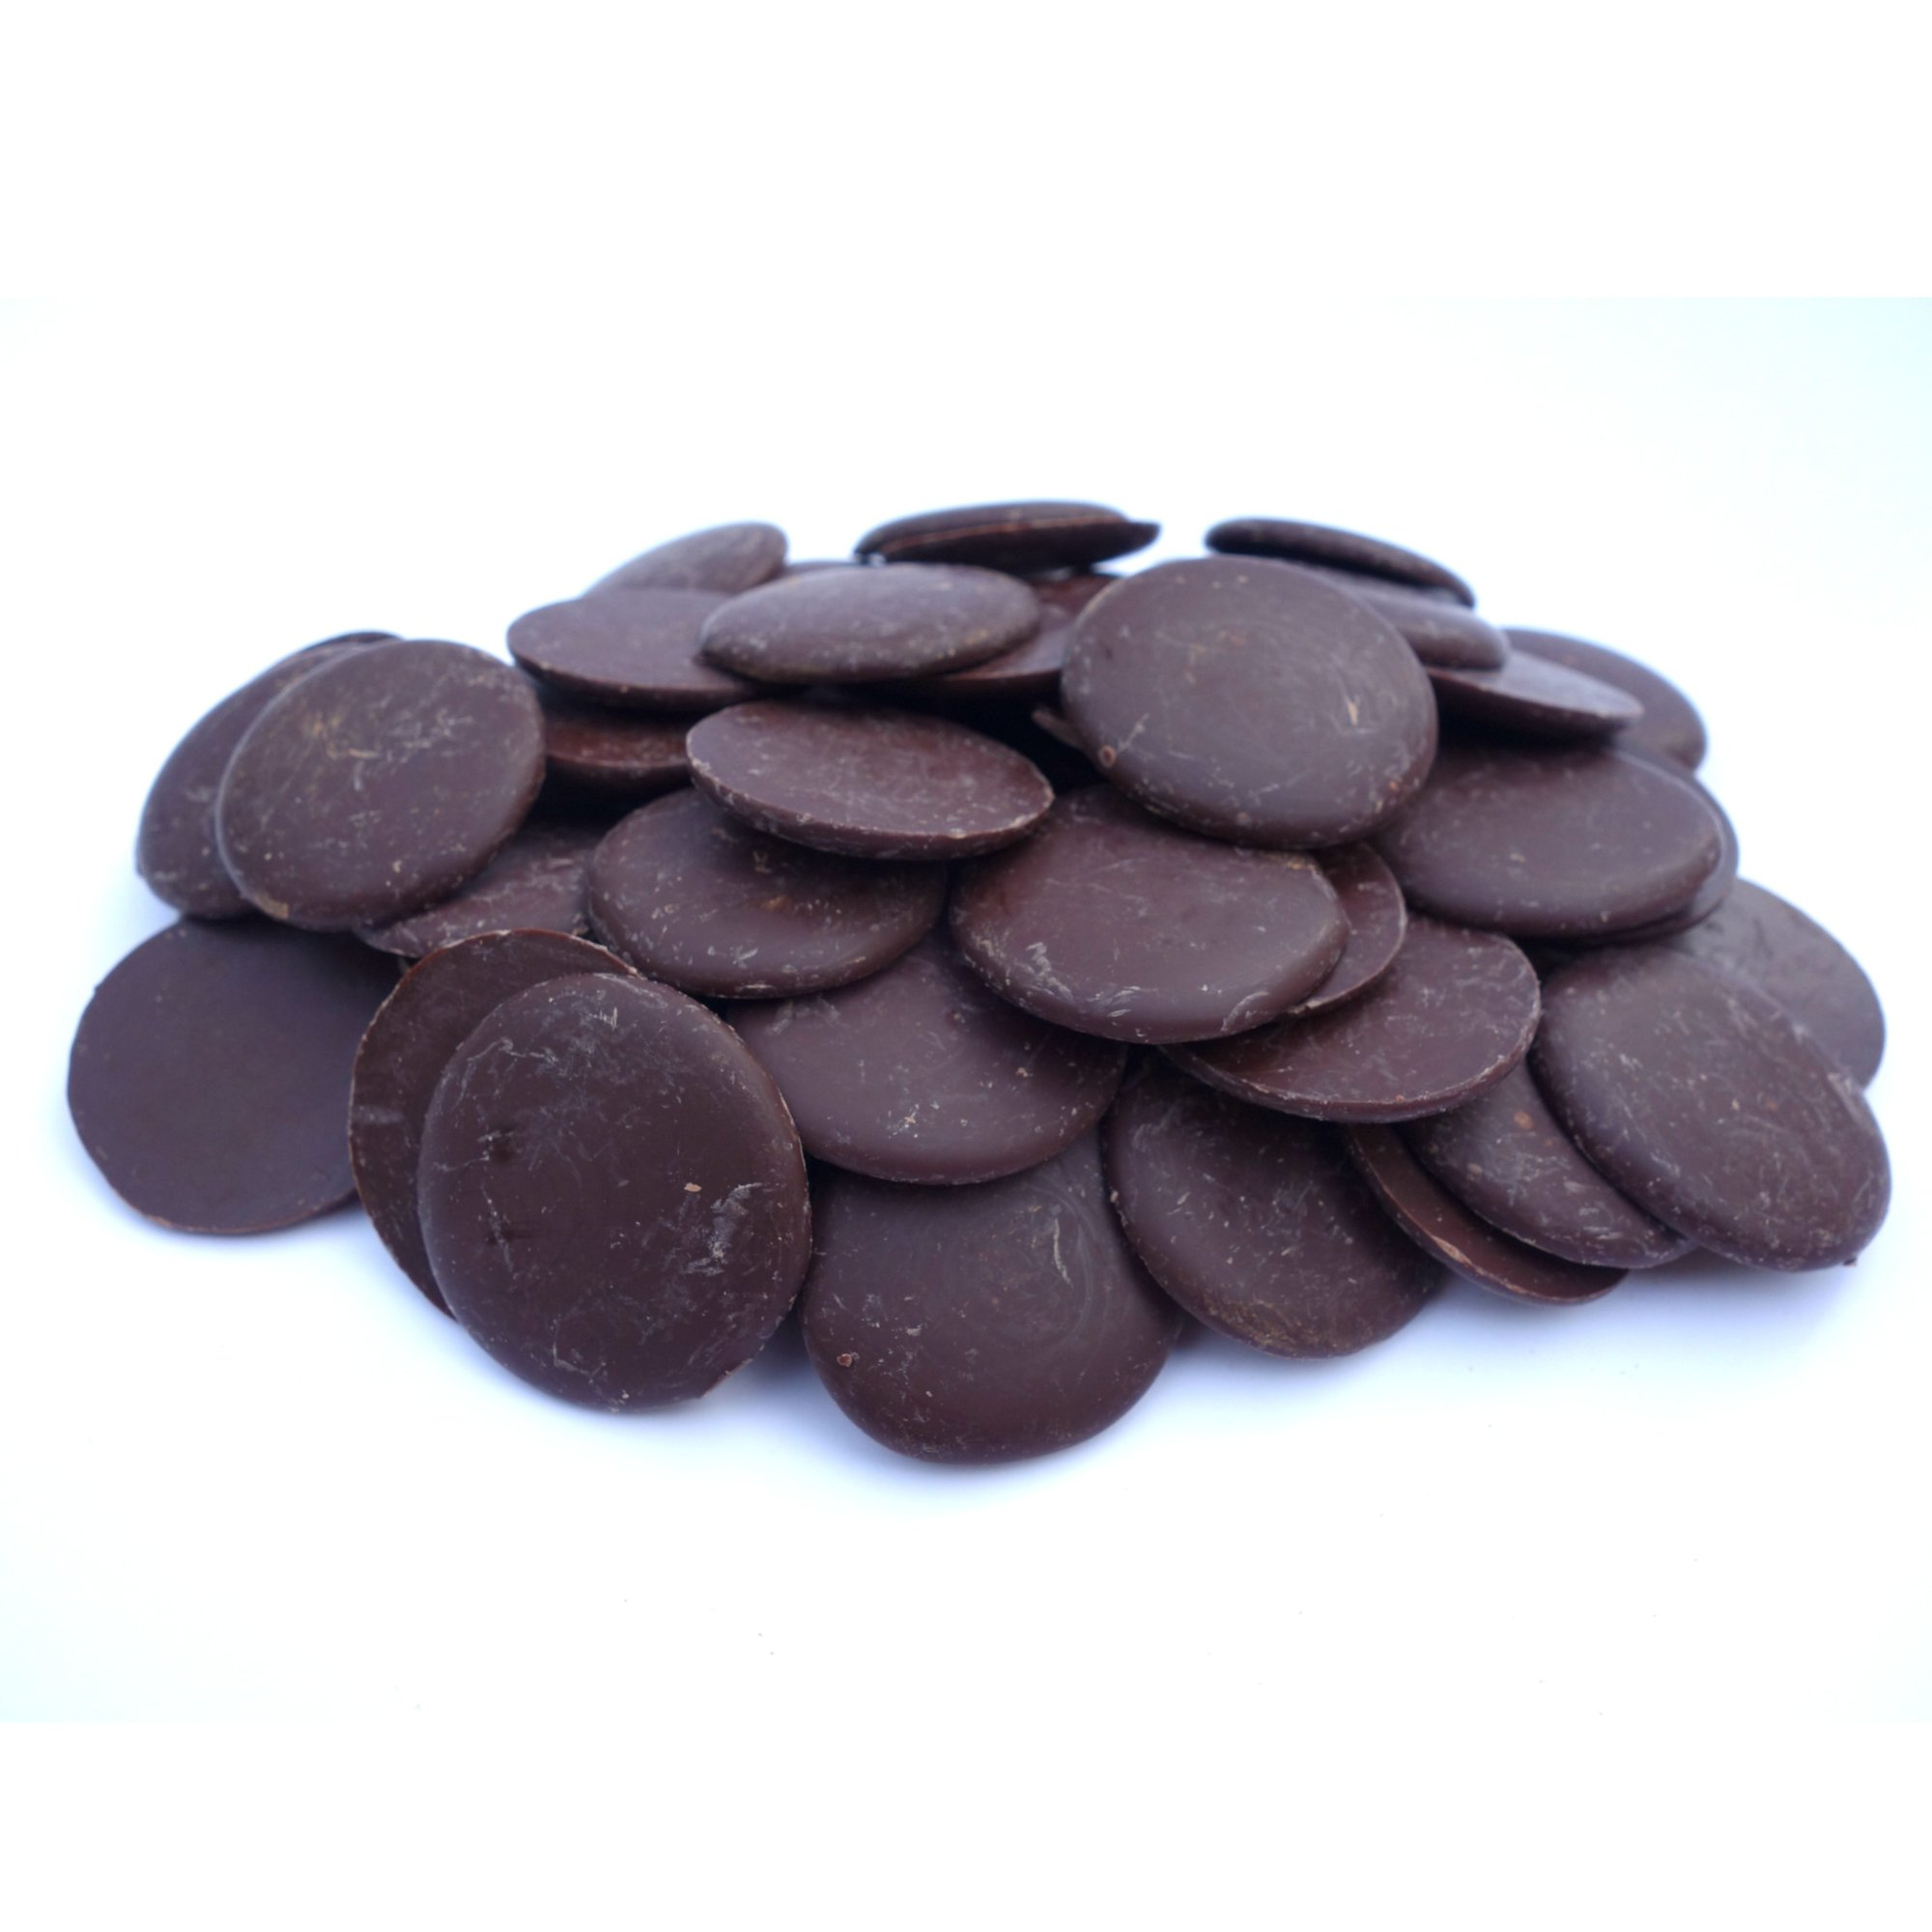 Pitch Dark 72% Chocolate Buttons | Raw Chocolate Company